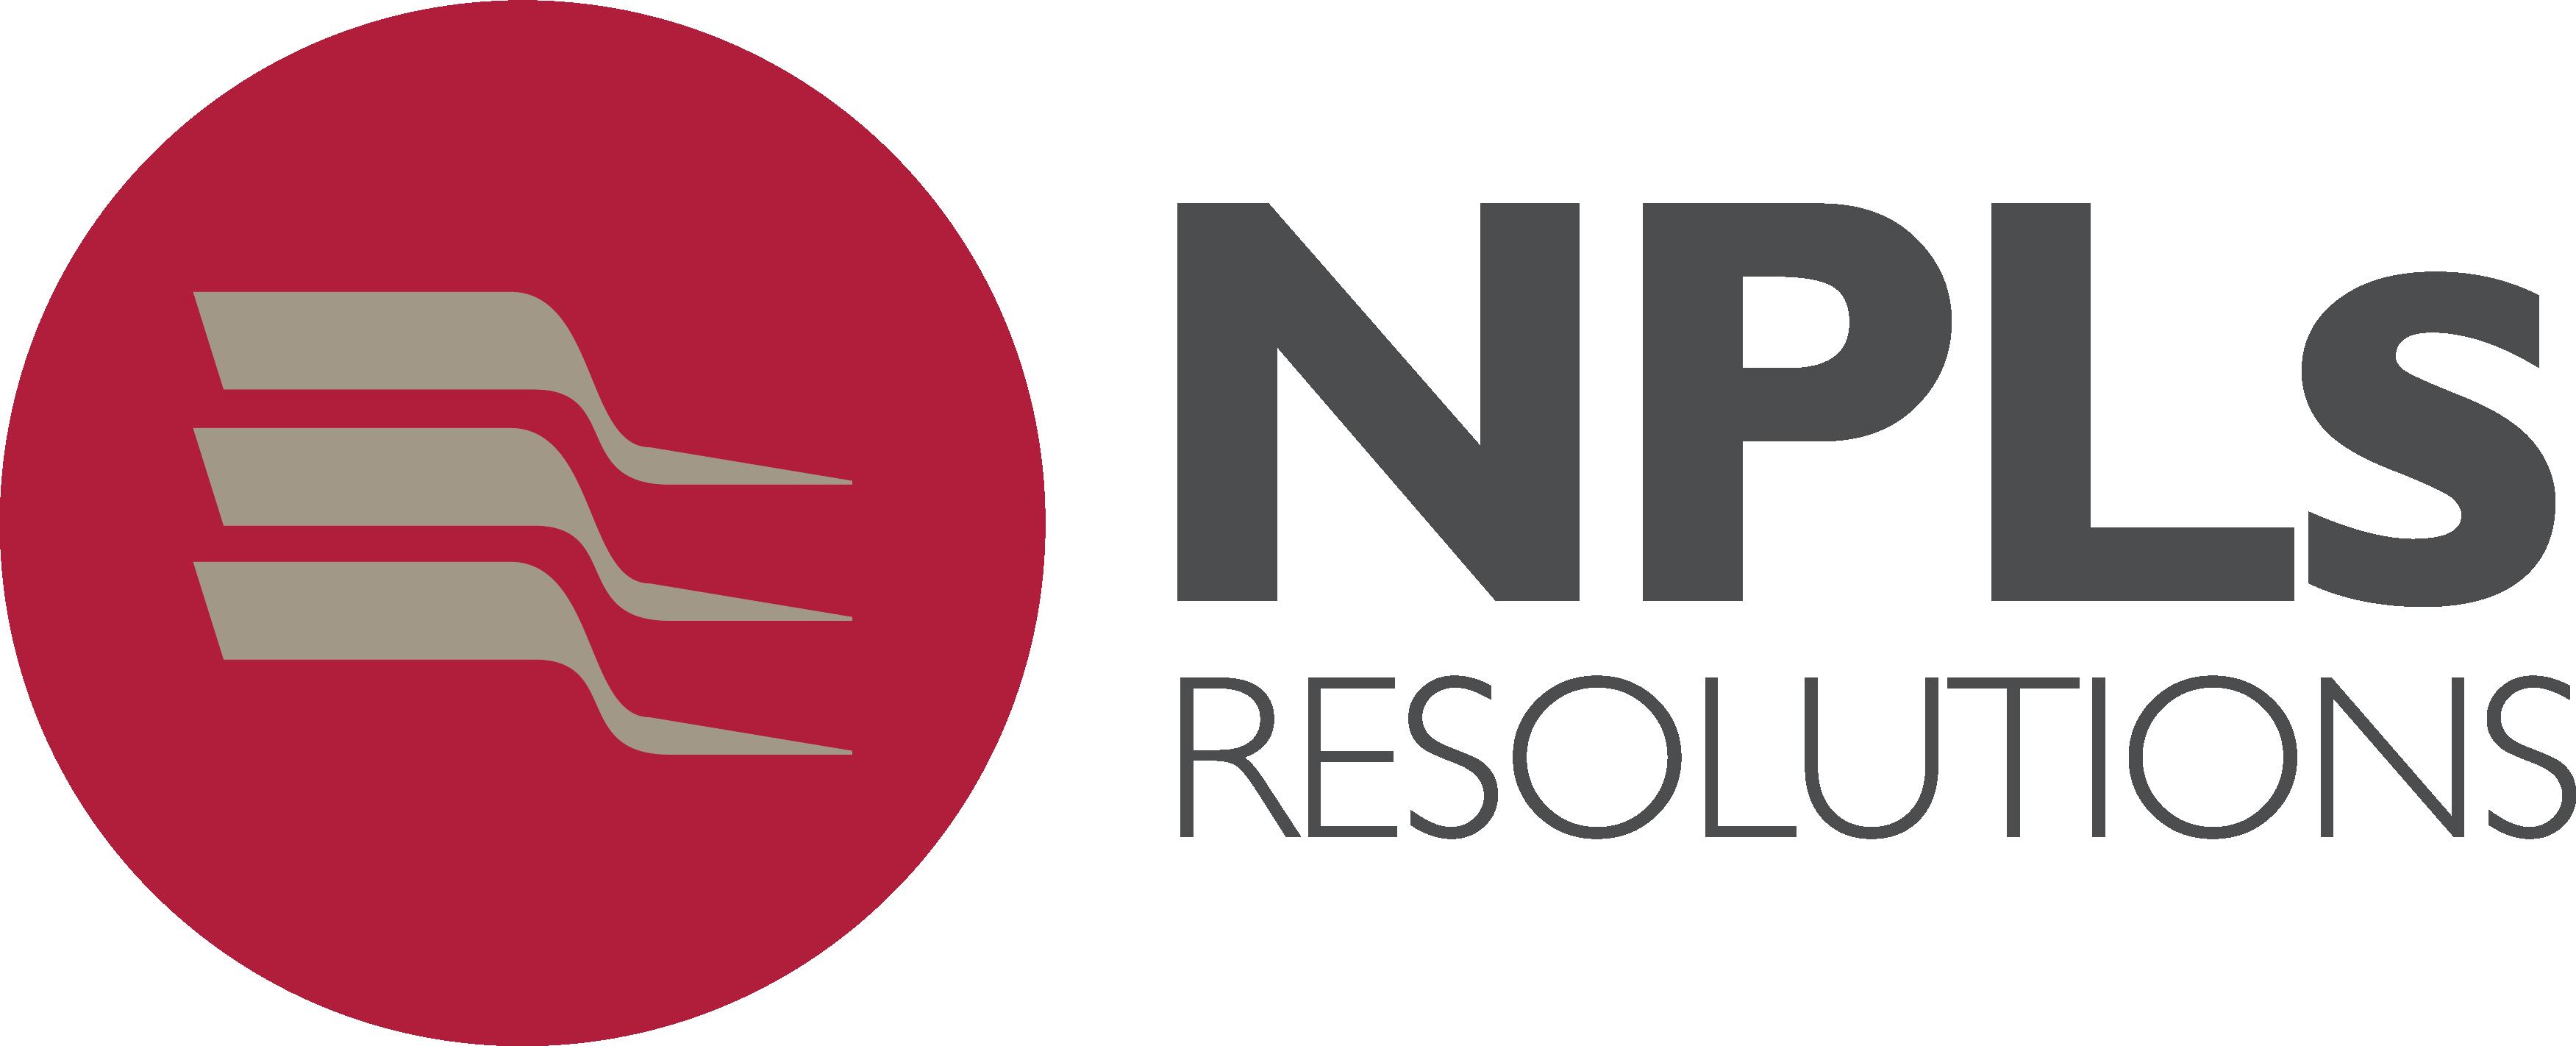 NPL Resolution